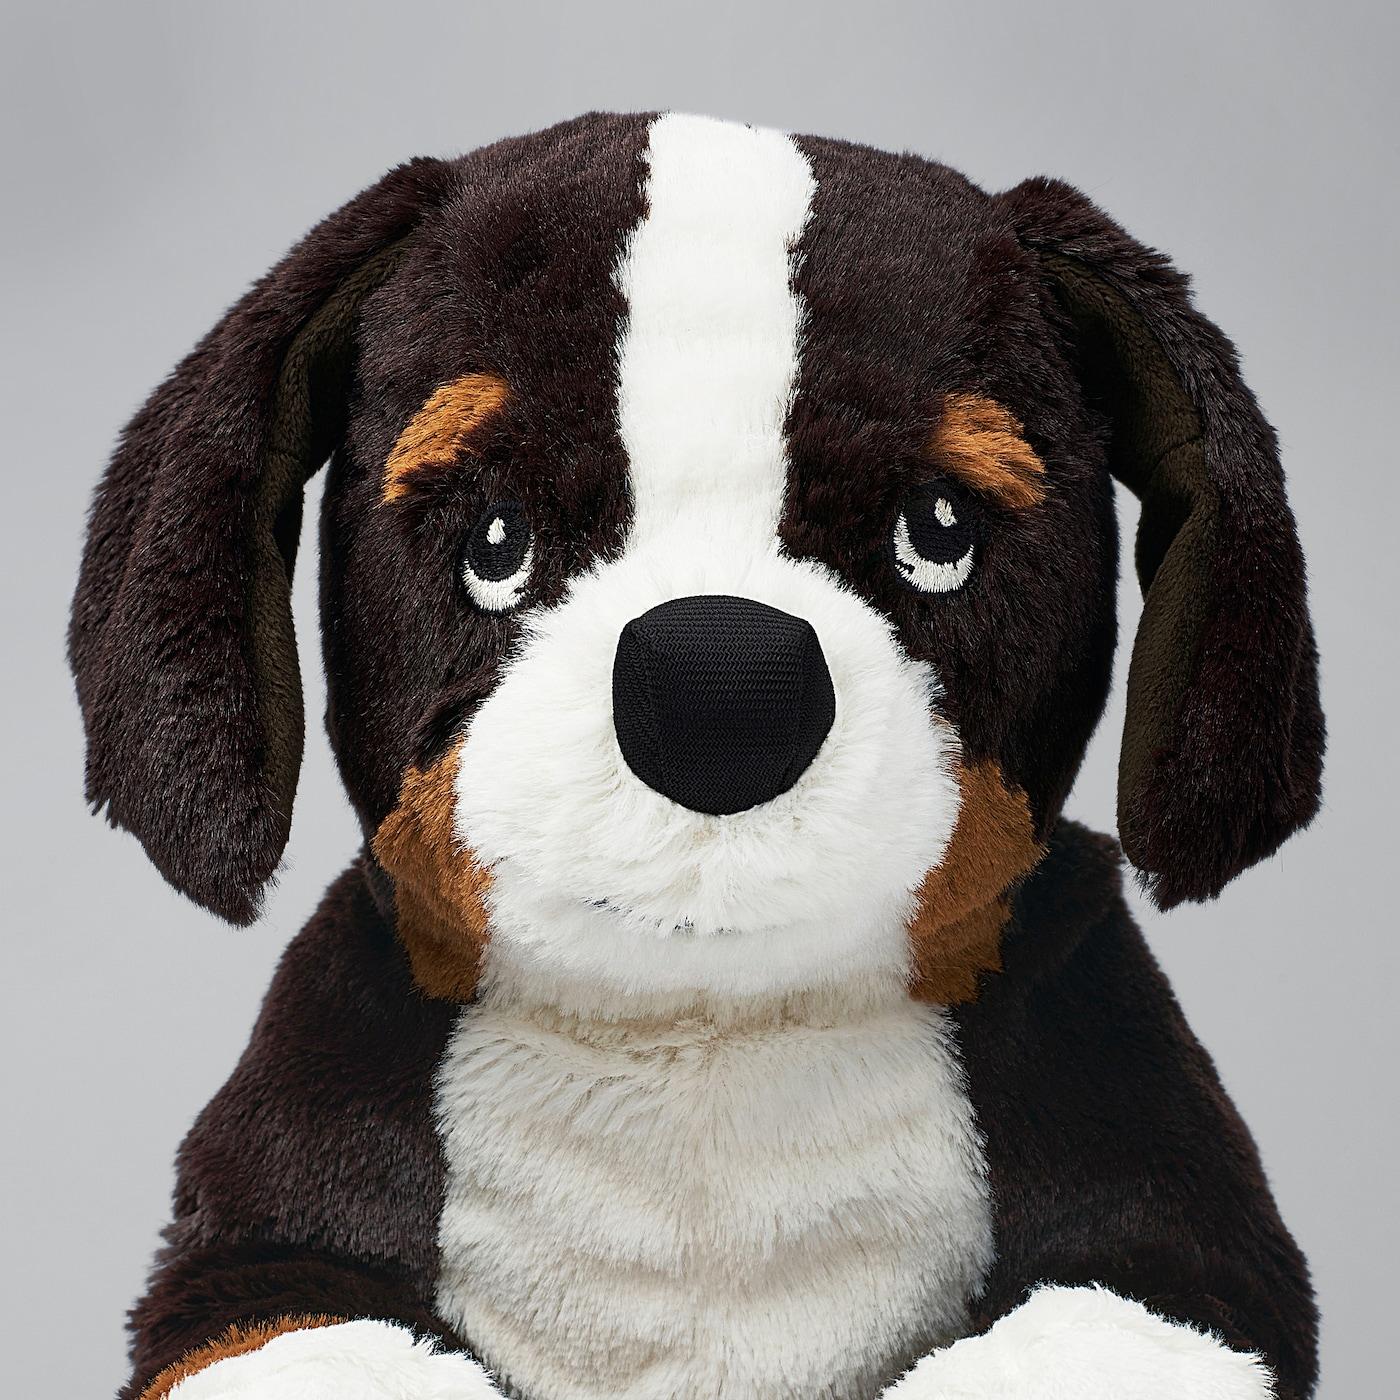 HOPPIG Plišana igračka, pas/bernski planinski pas, 36 cm